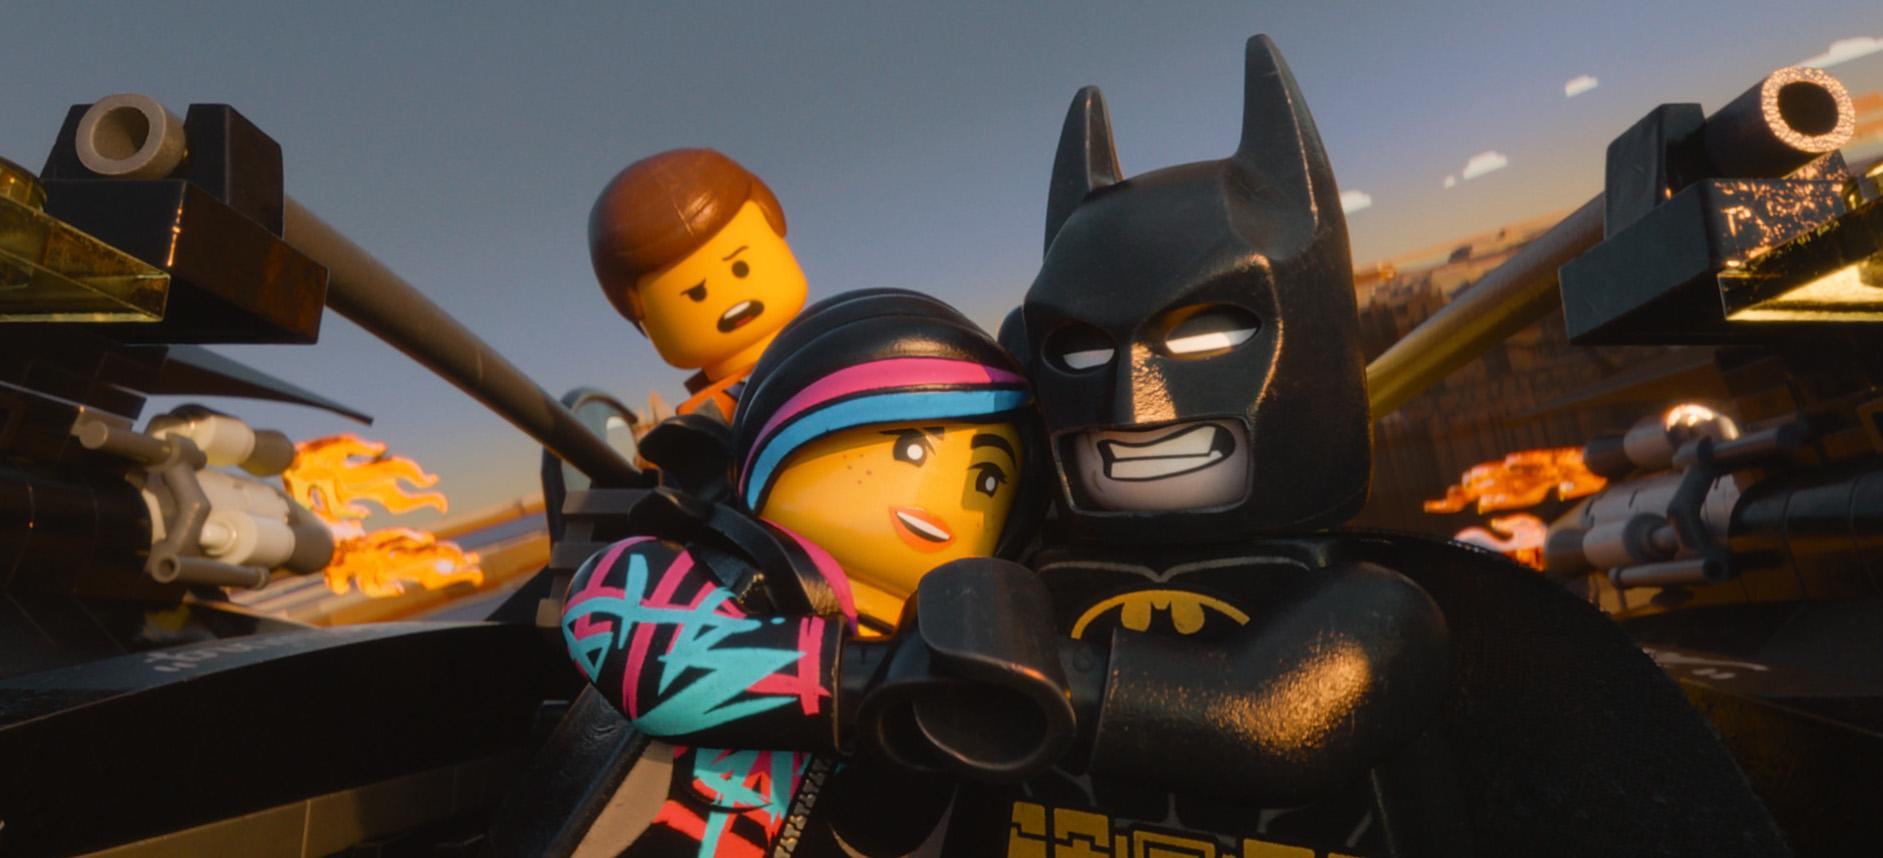 The Lego Movie Review: Haphazard Fun